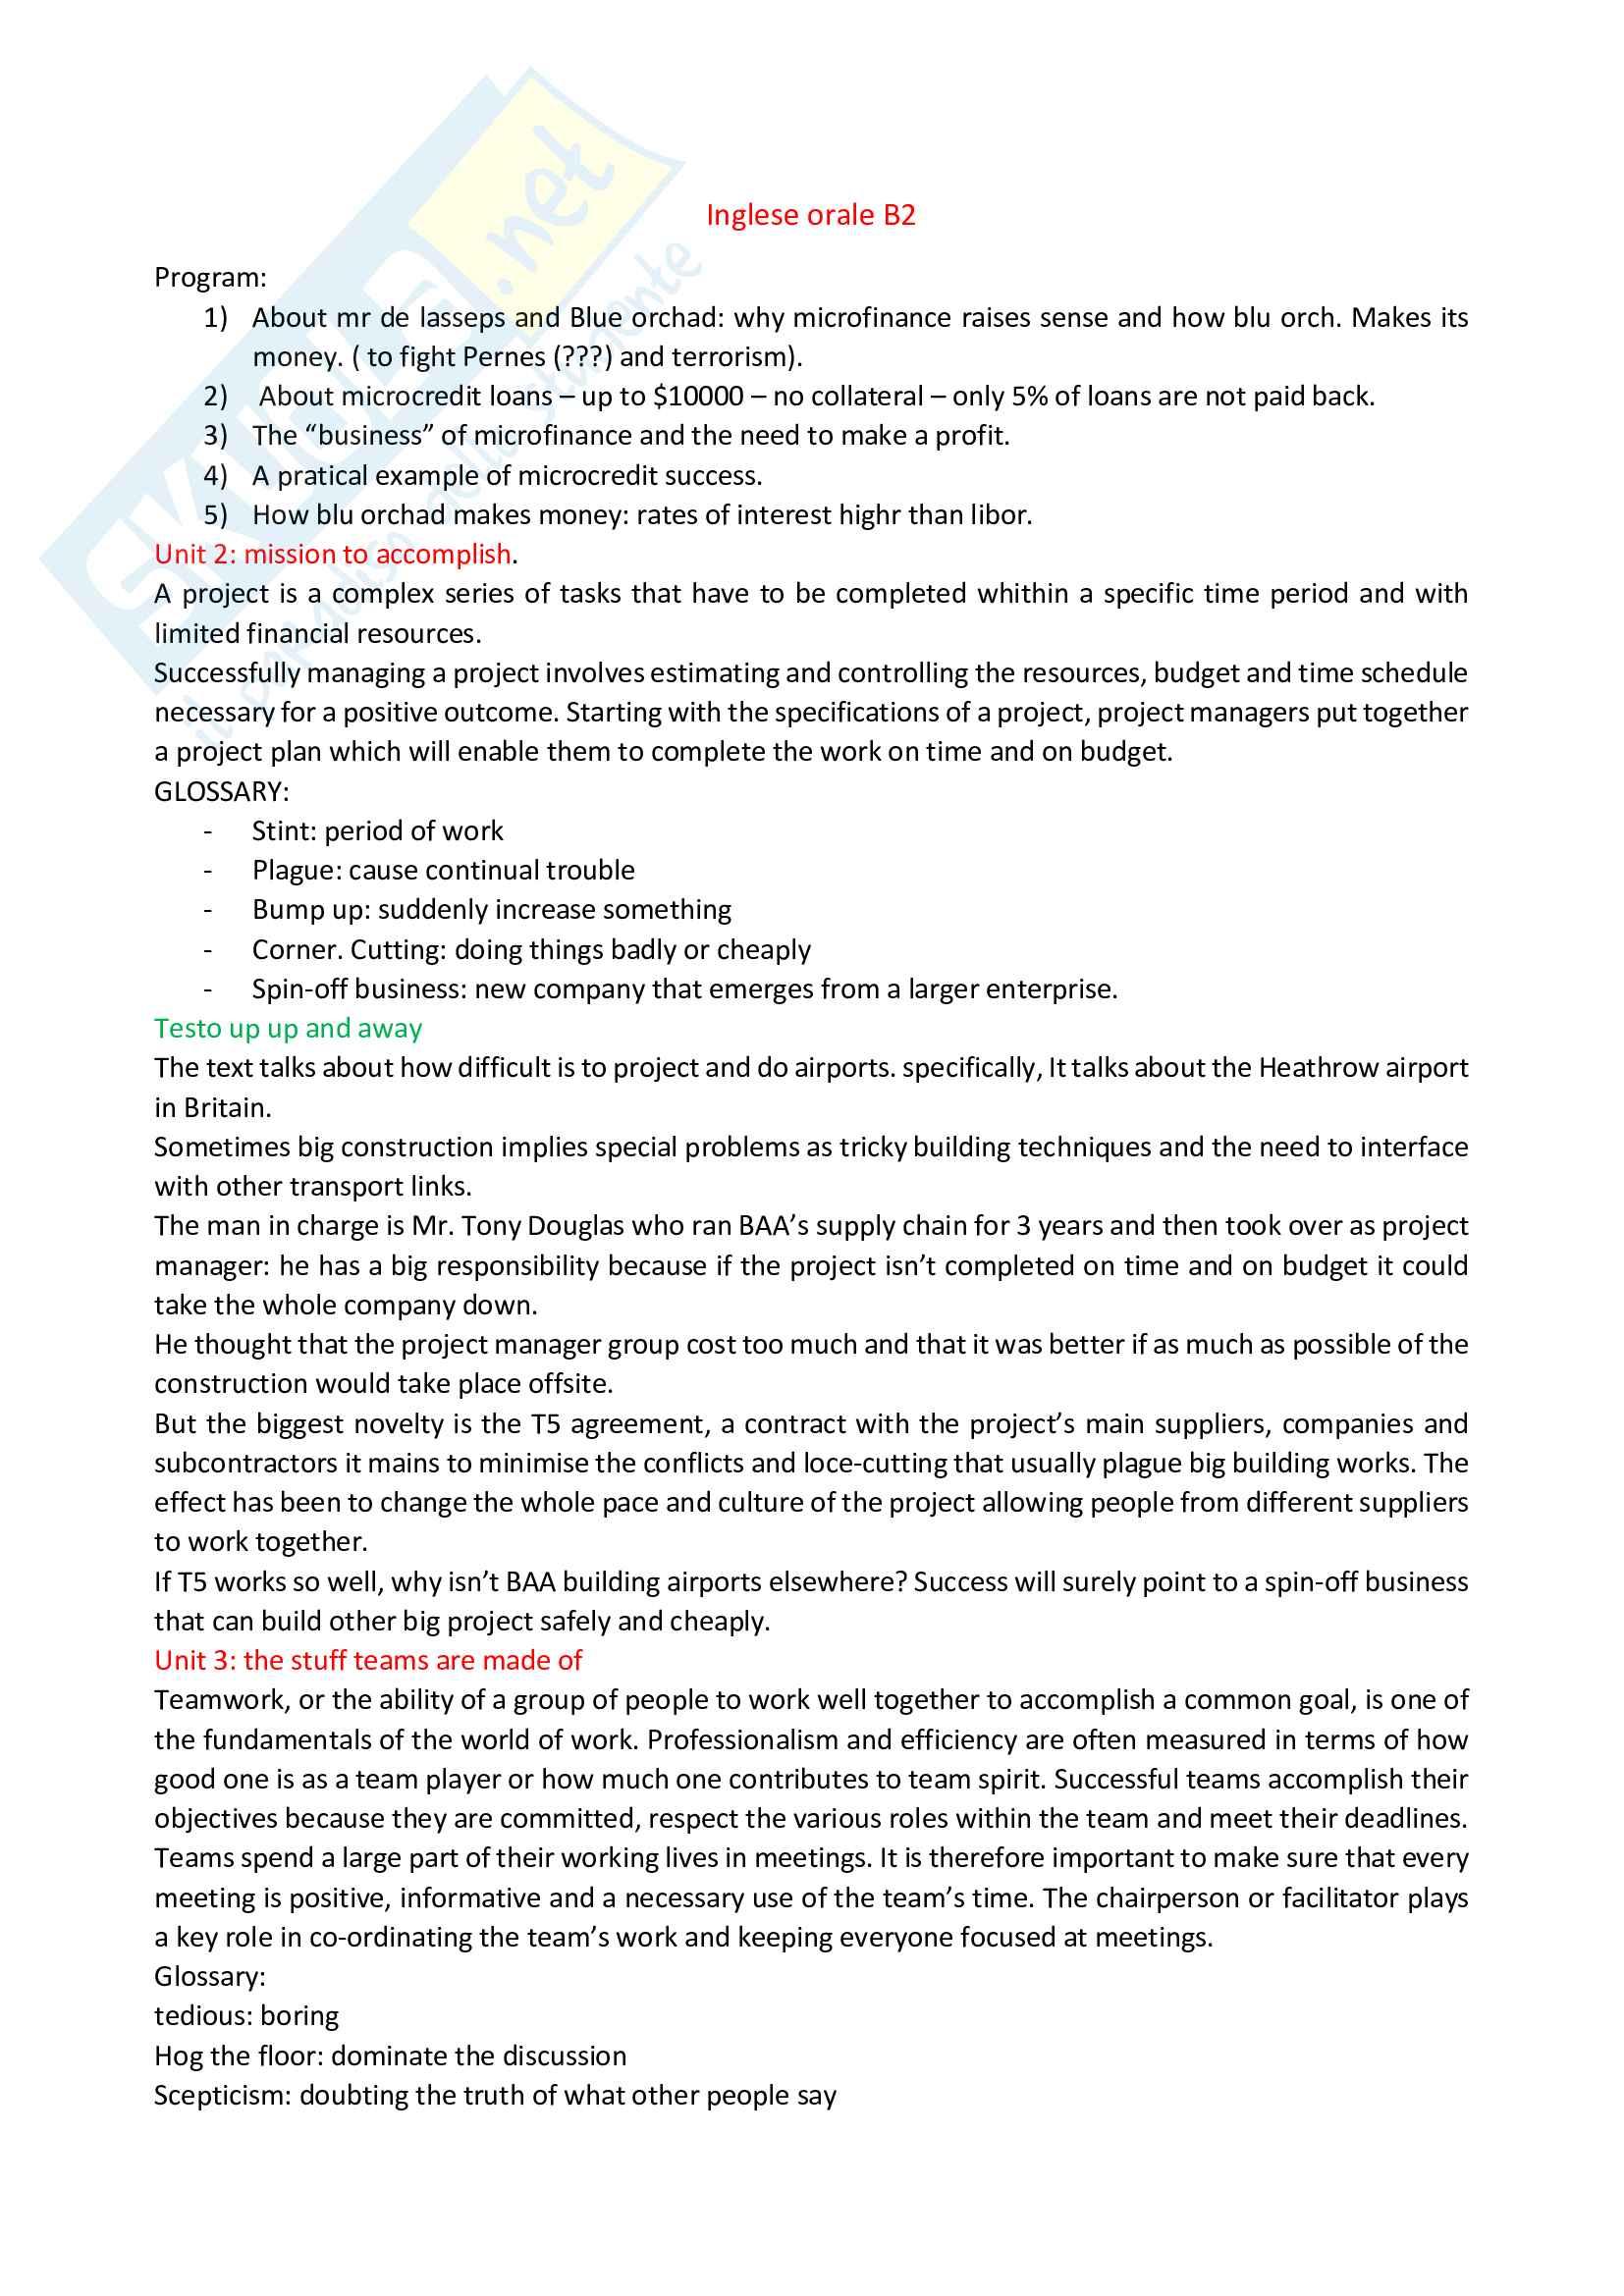 Appunti testi inglese b2 Pag. 1